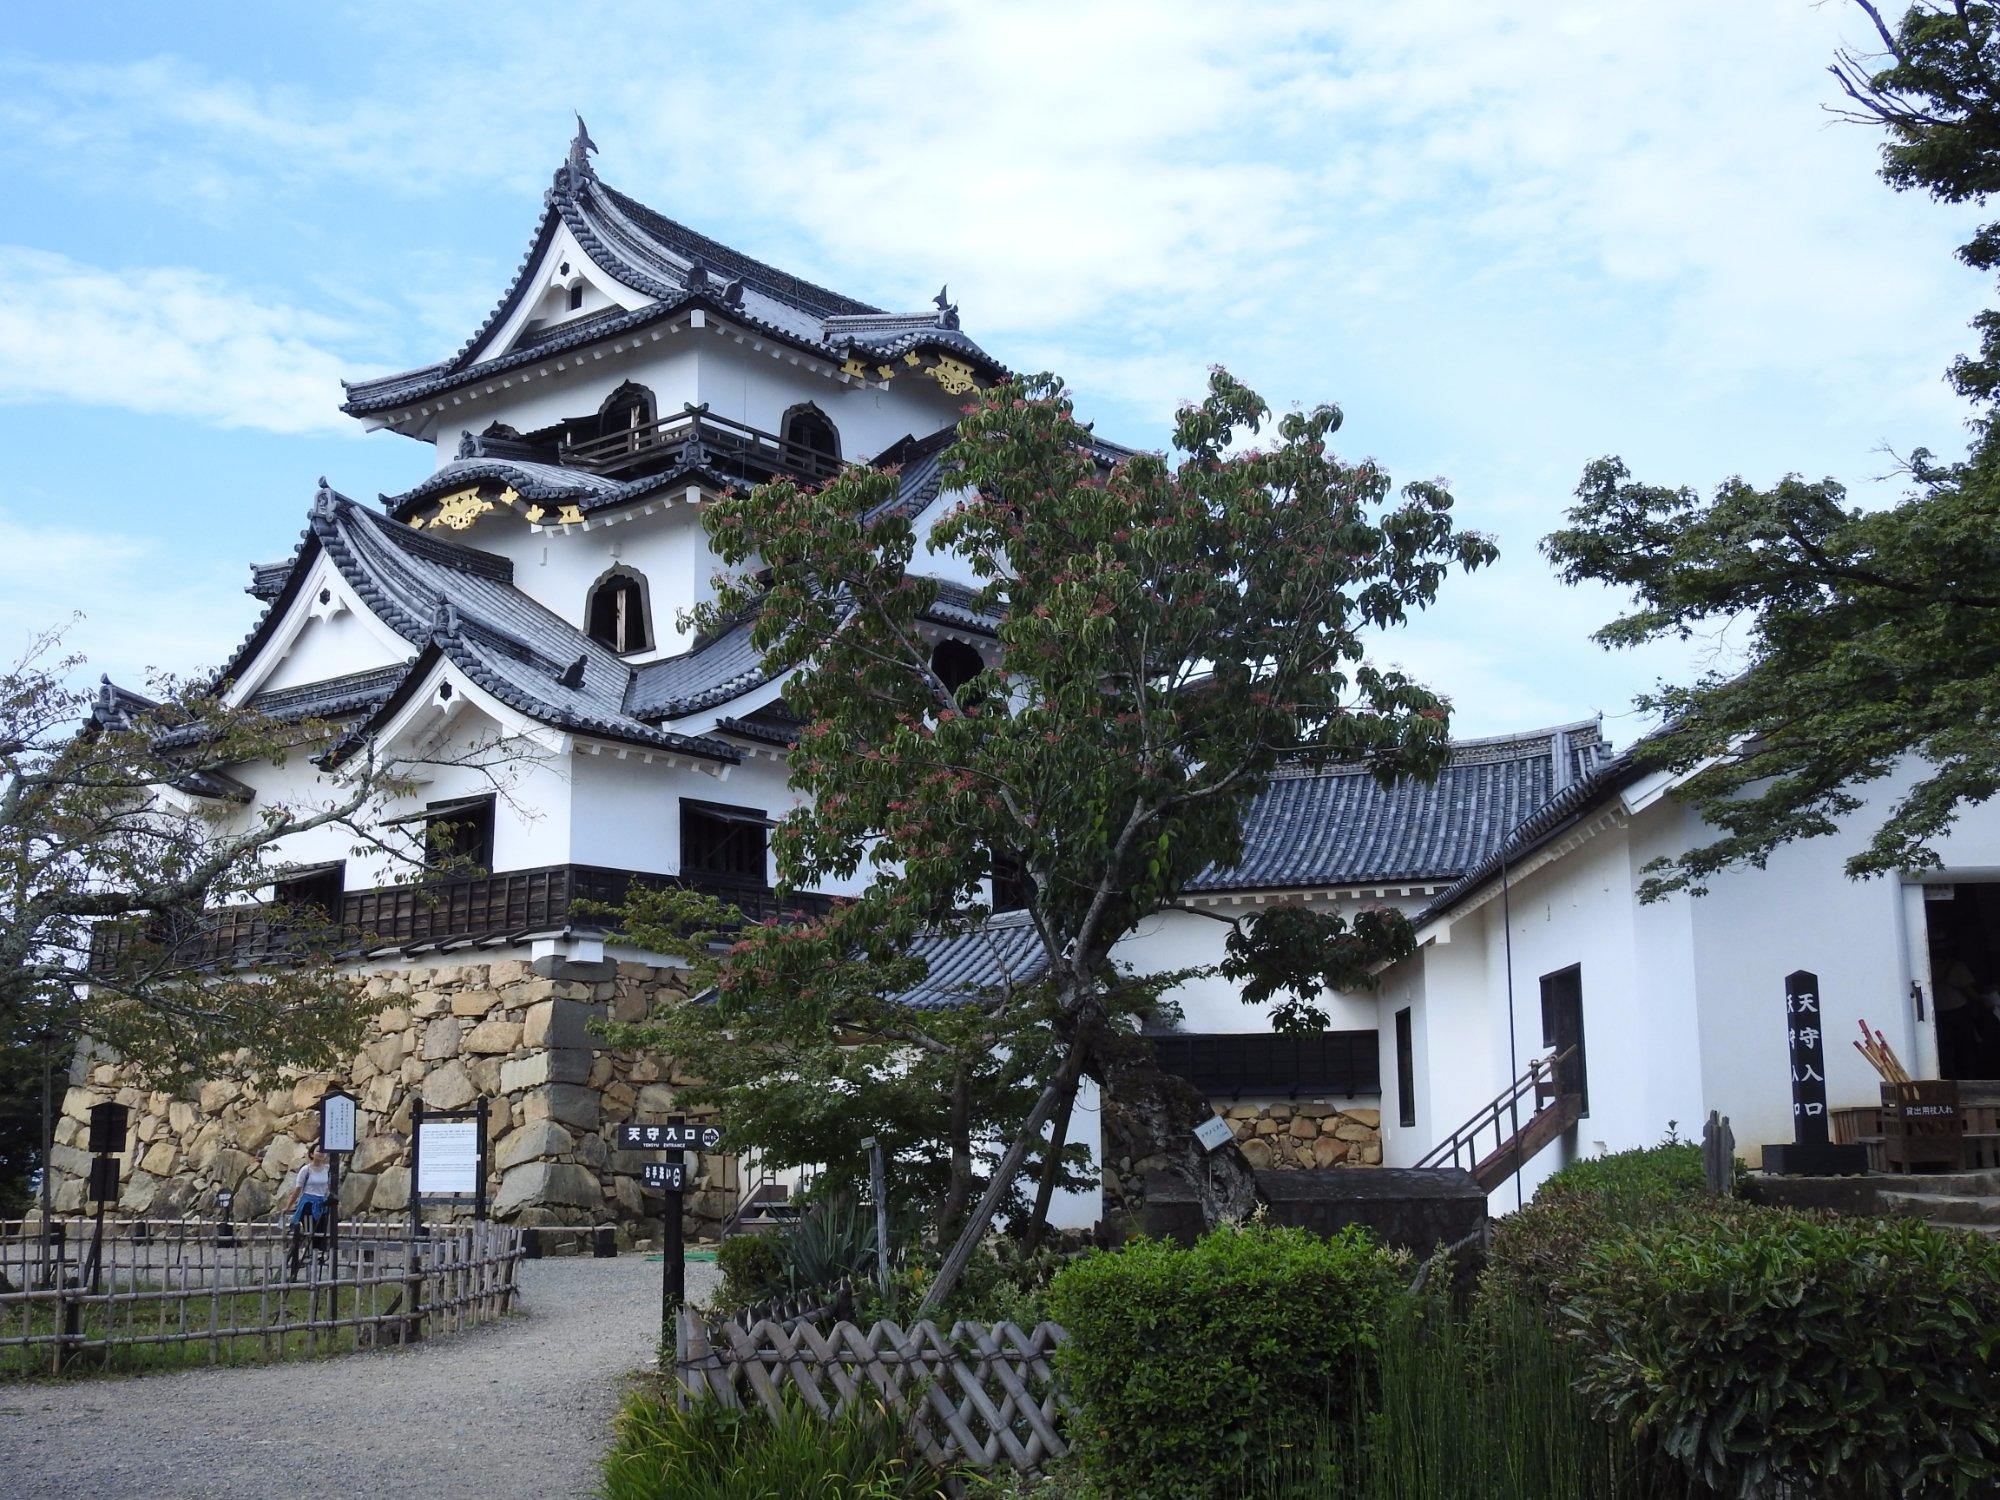 Hikone and The Castle of Lake Biwa